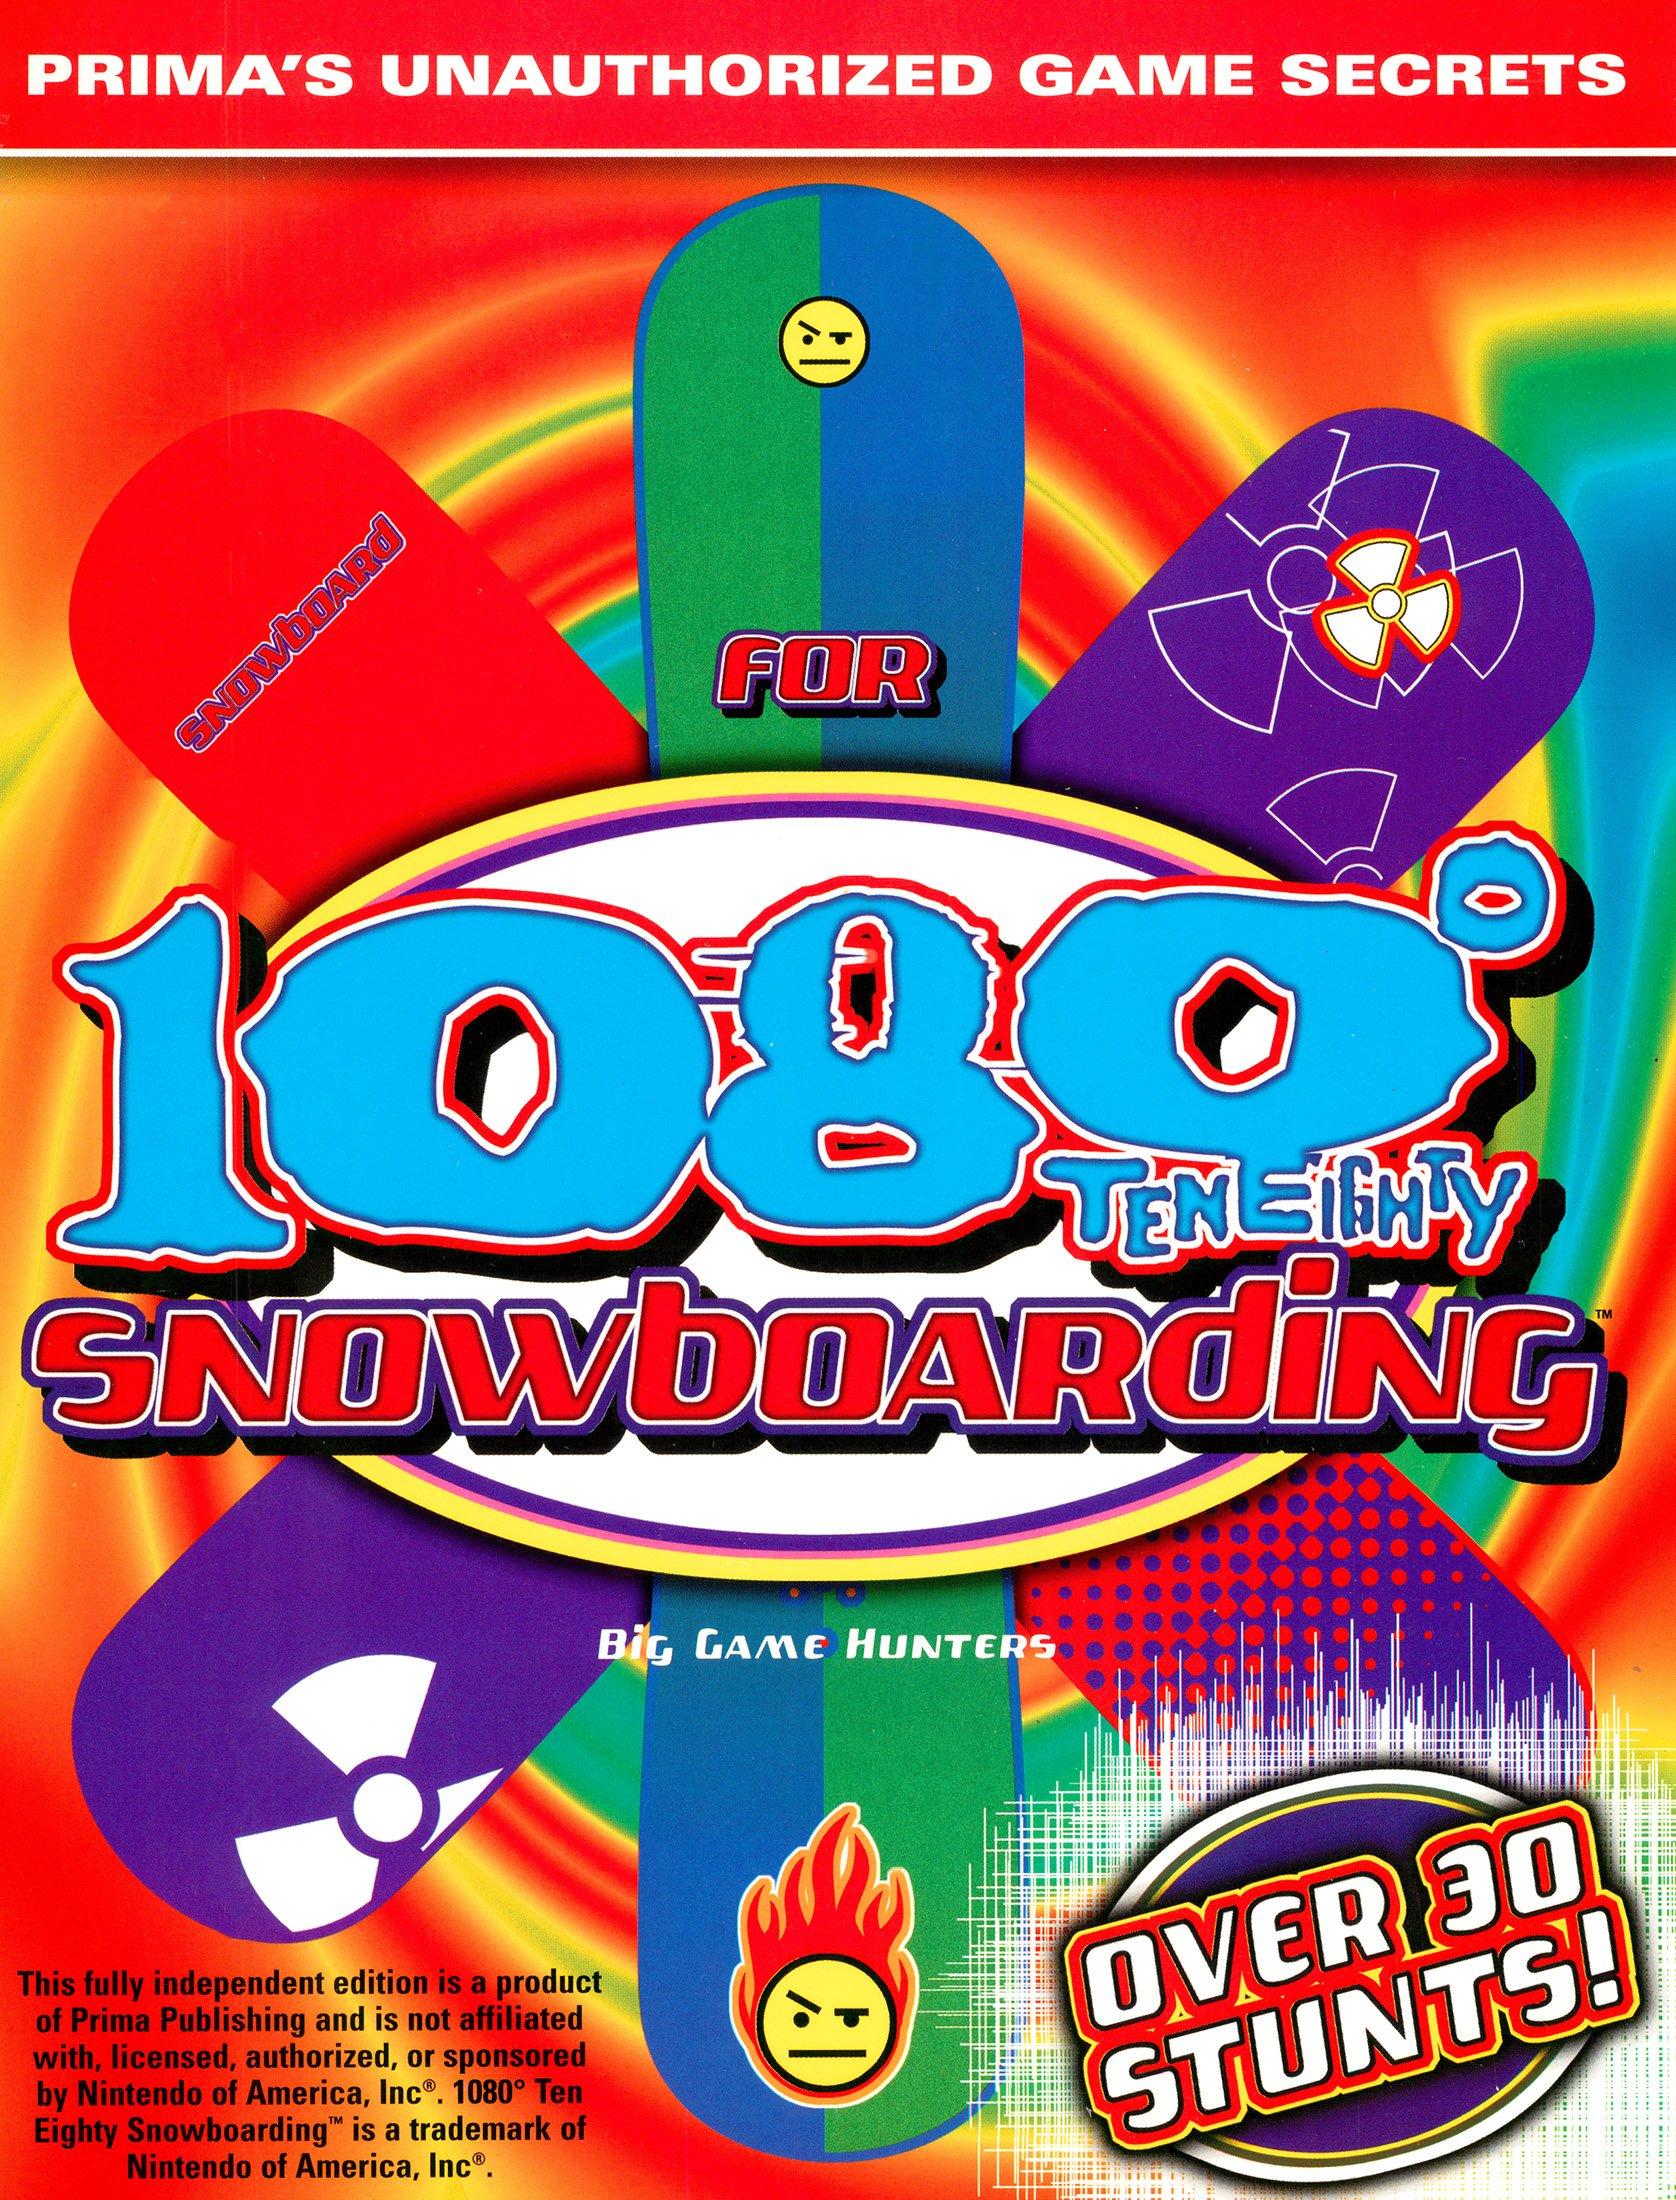 1080 Degree Snowboarding - Prima's Unauthorized Game Secrets